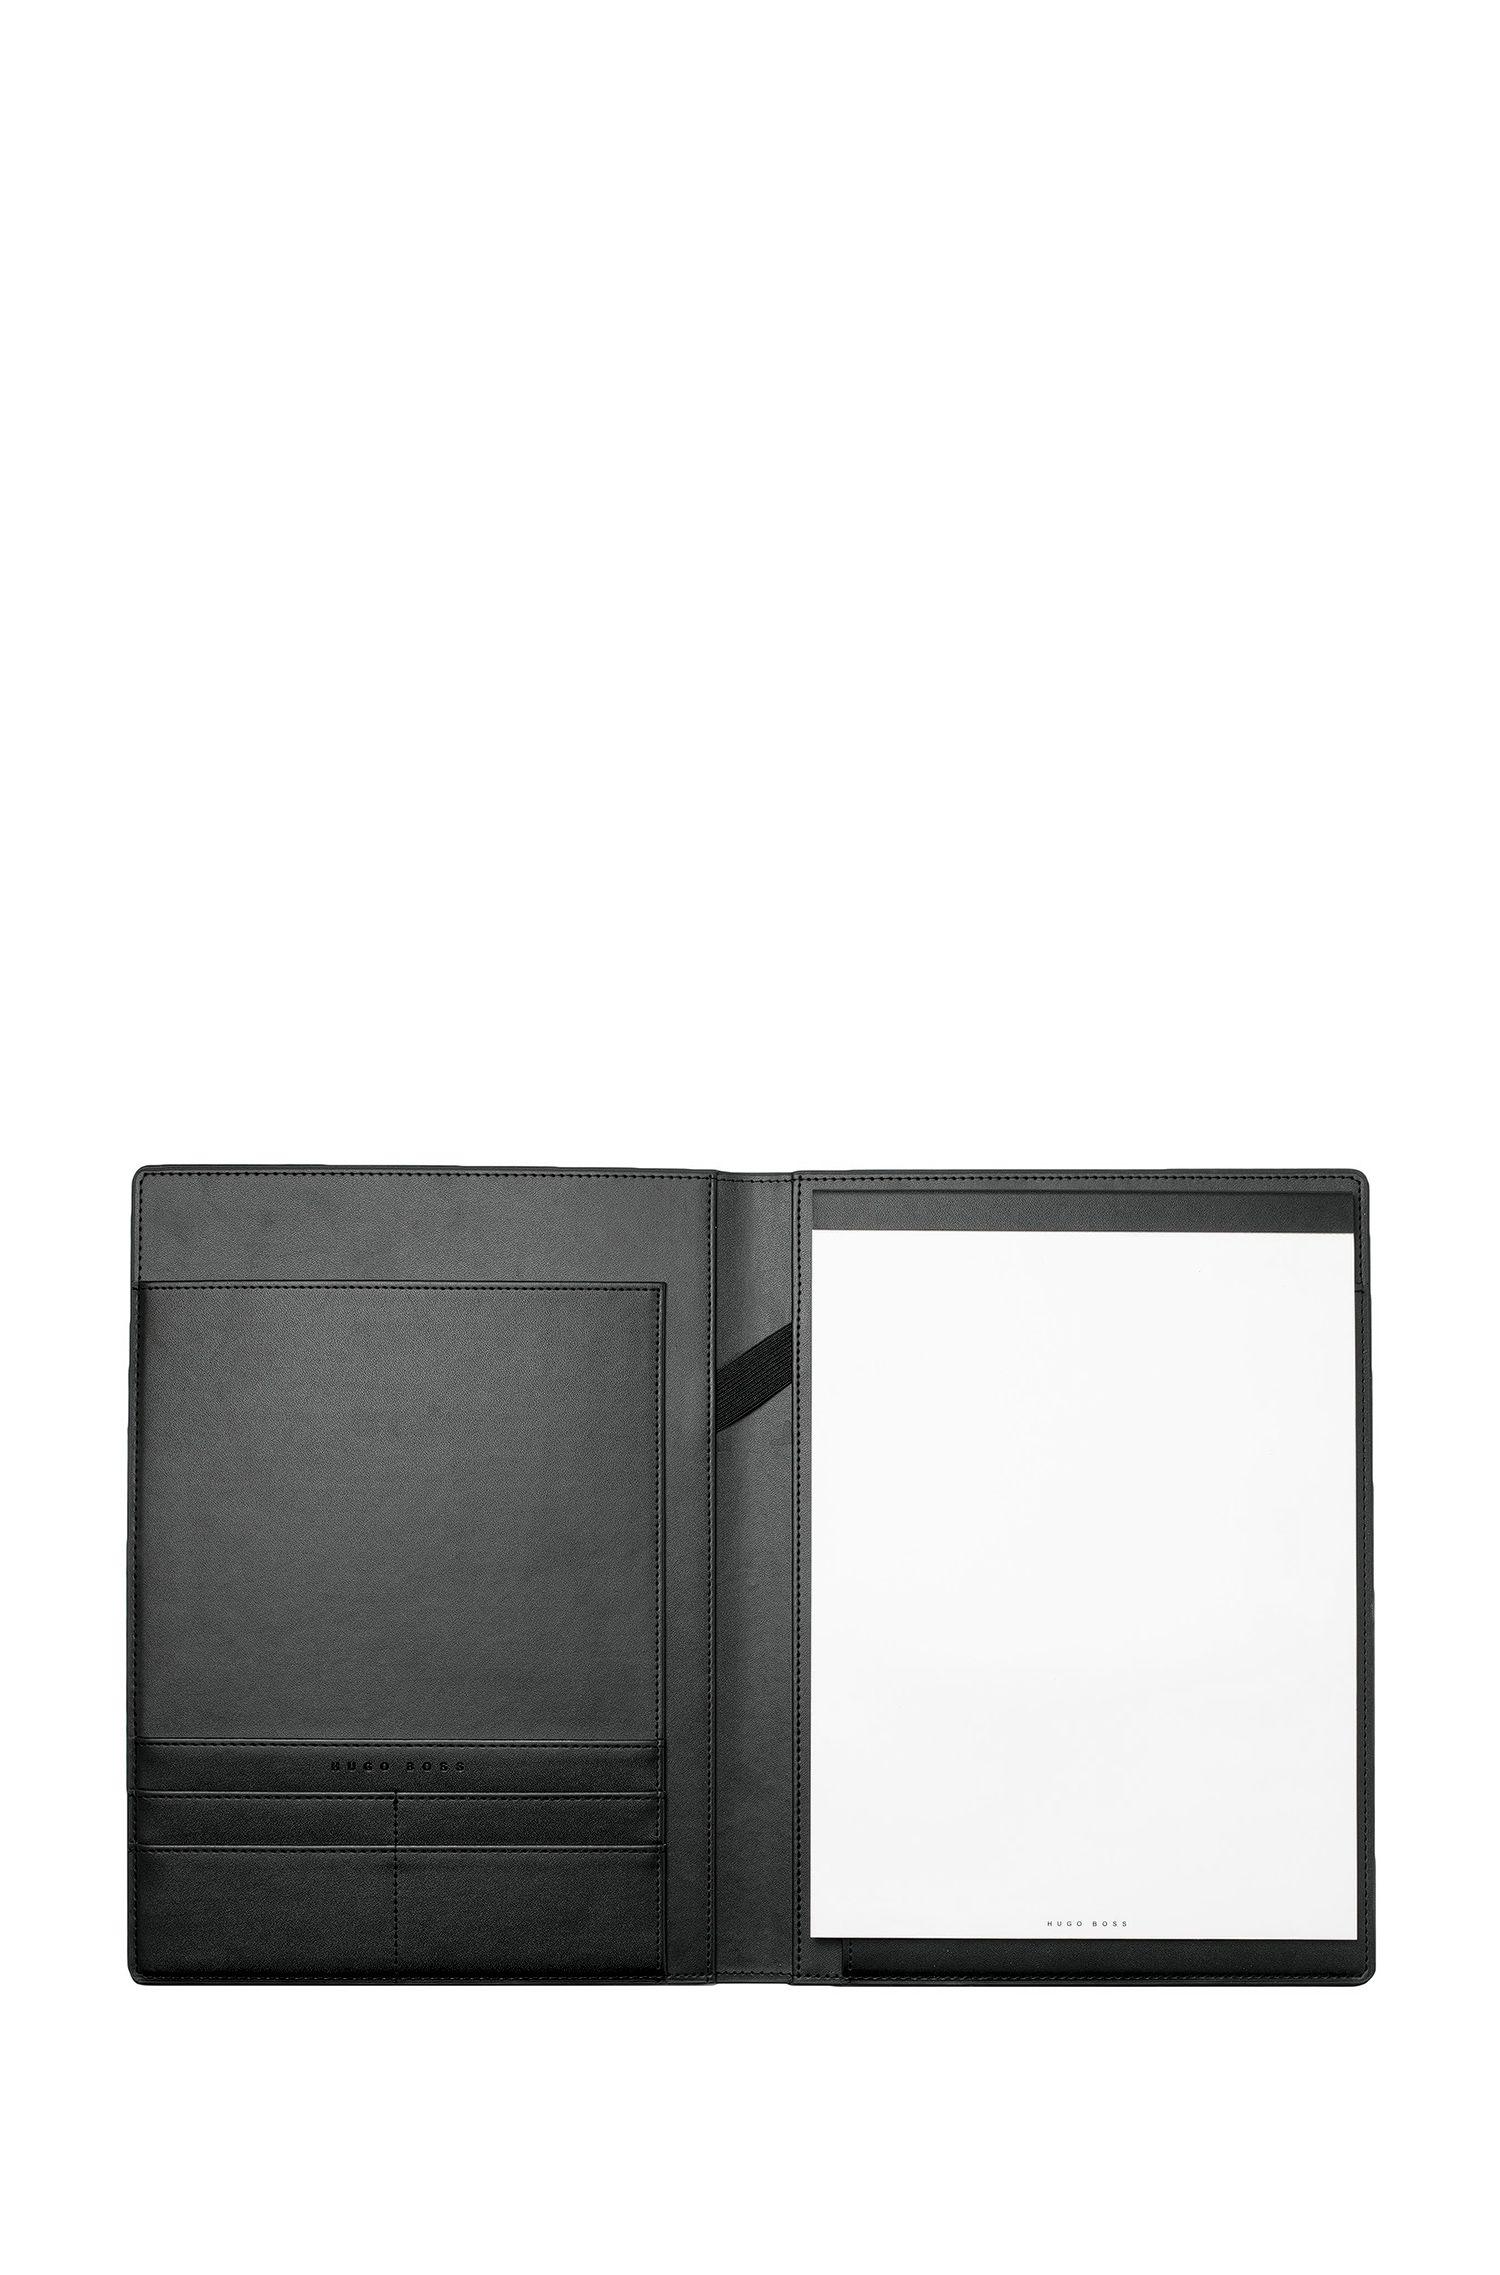 Carpeta A4 negra con textura y logo en oro rosado